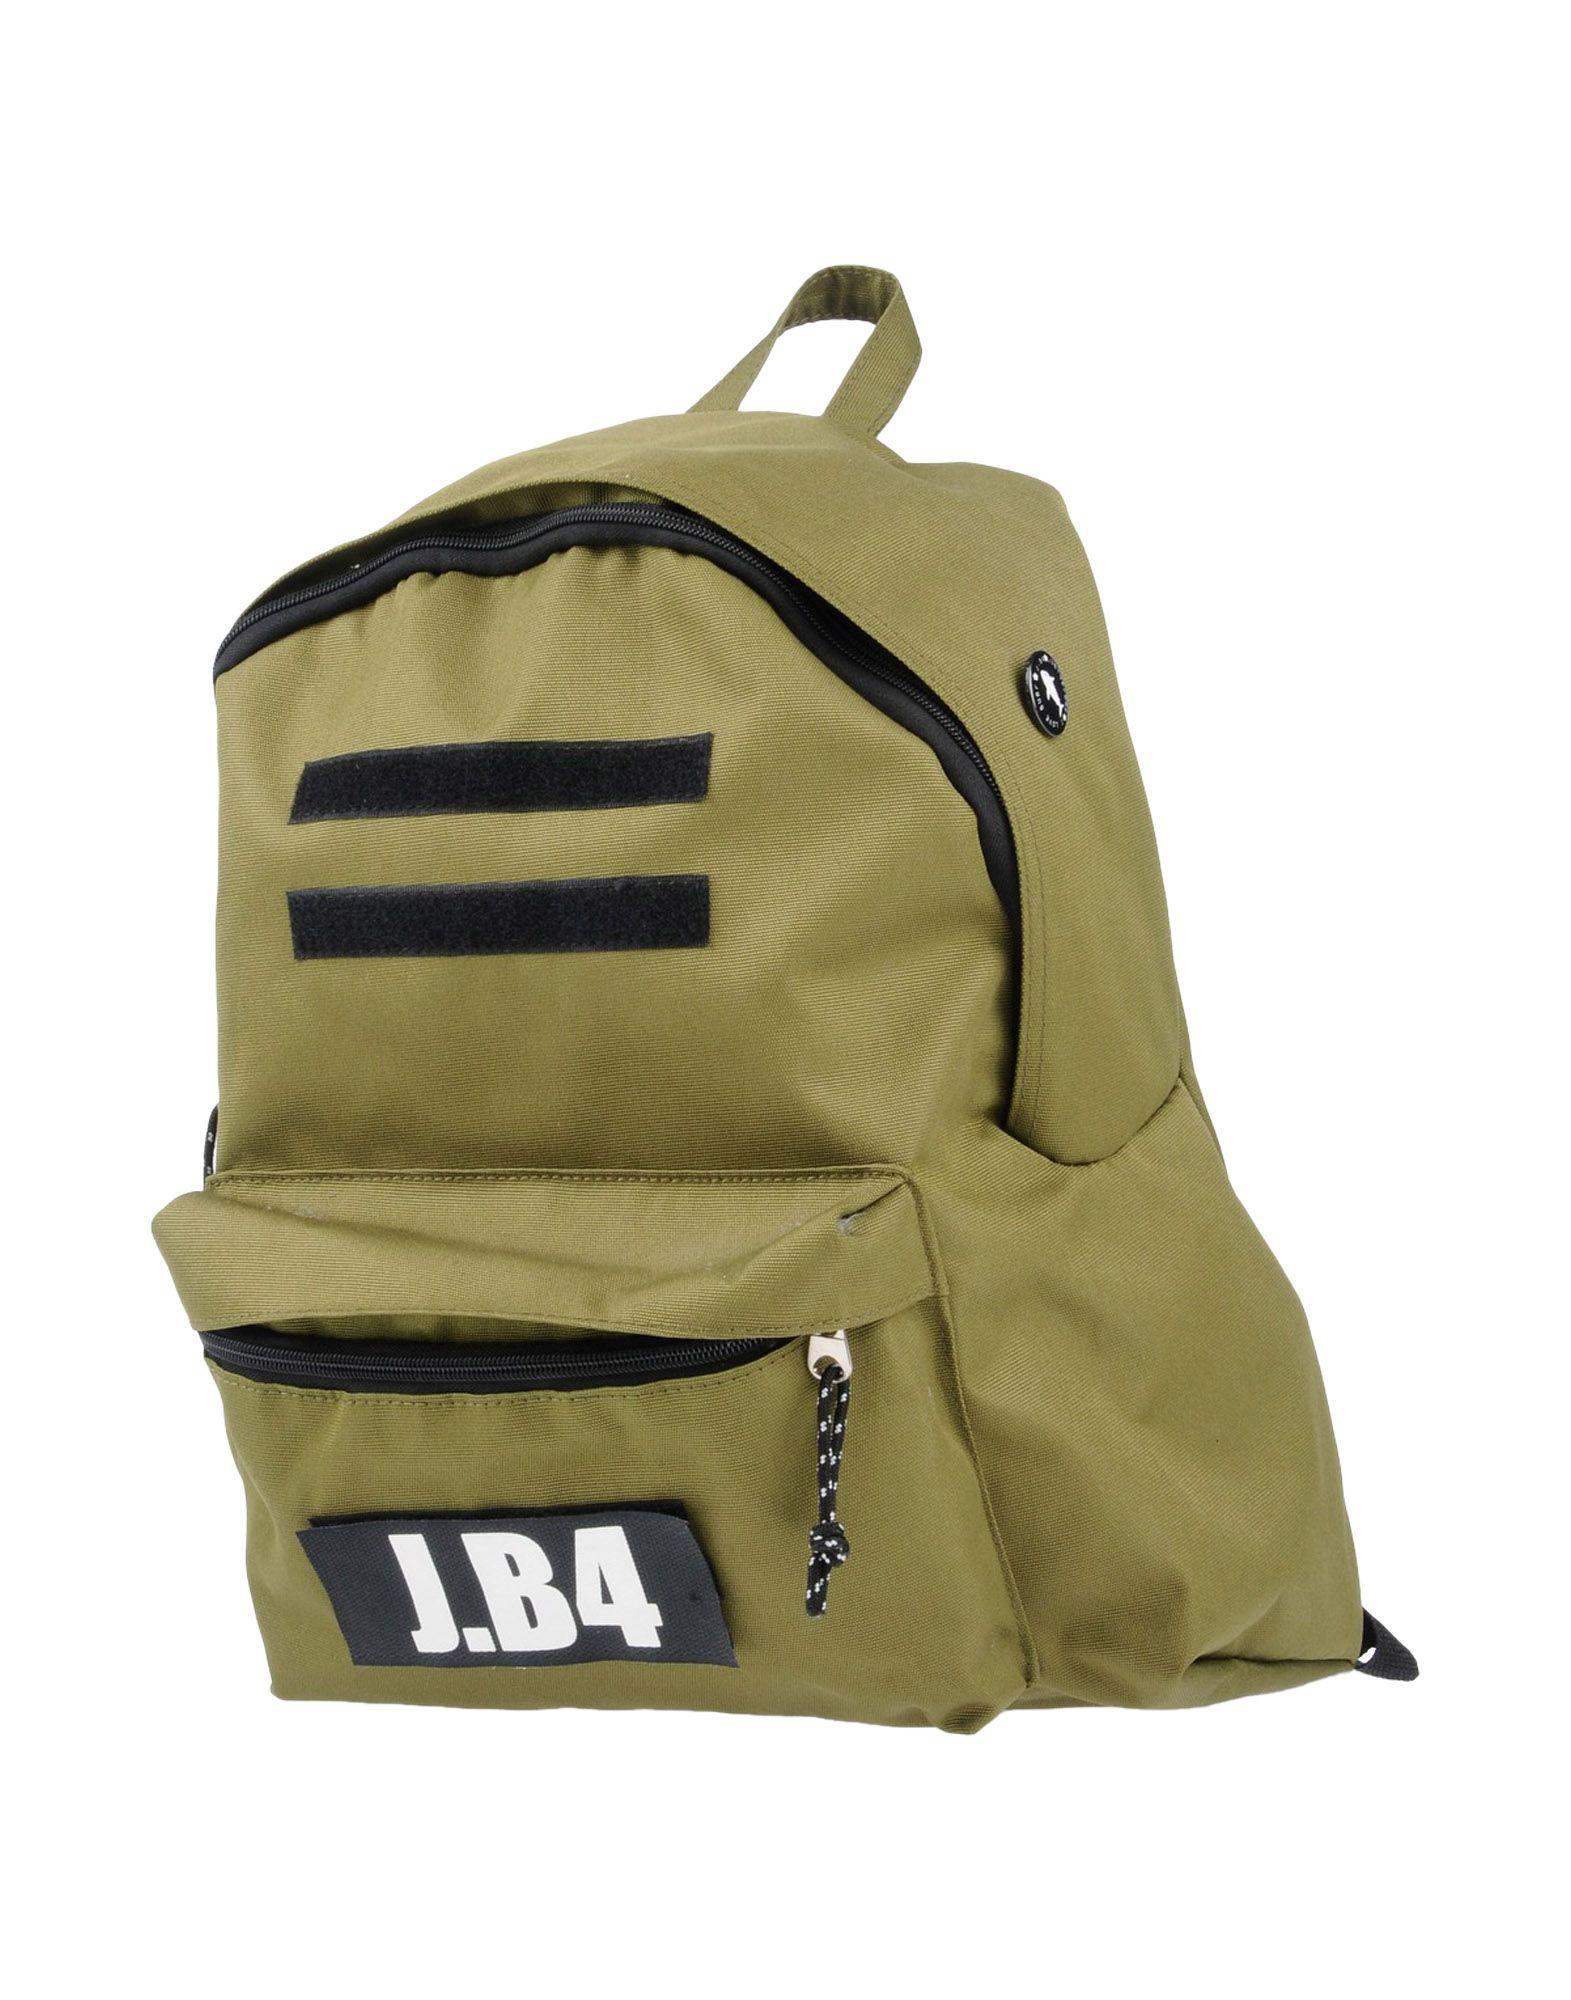 BAGS - Handbags JB4 JustBefore uGKMCD